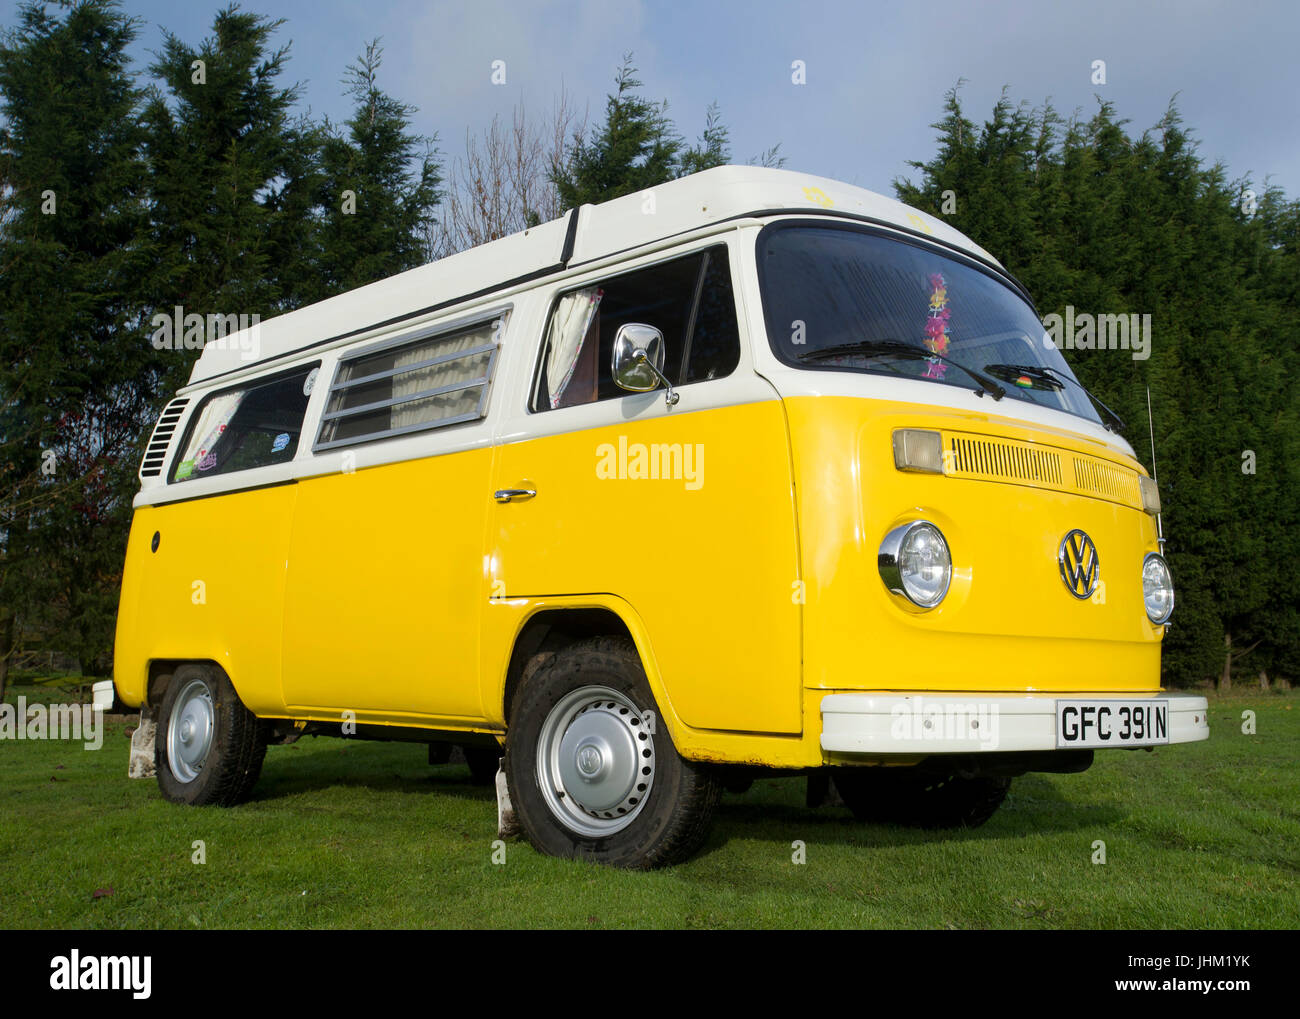 bd5ebd3ddc Yellow Vw Campervan Stock Photos   Yellow Vw Campervan Stock Images ...